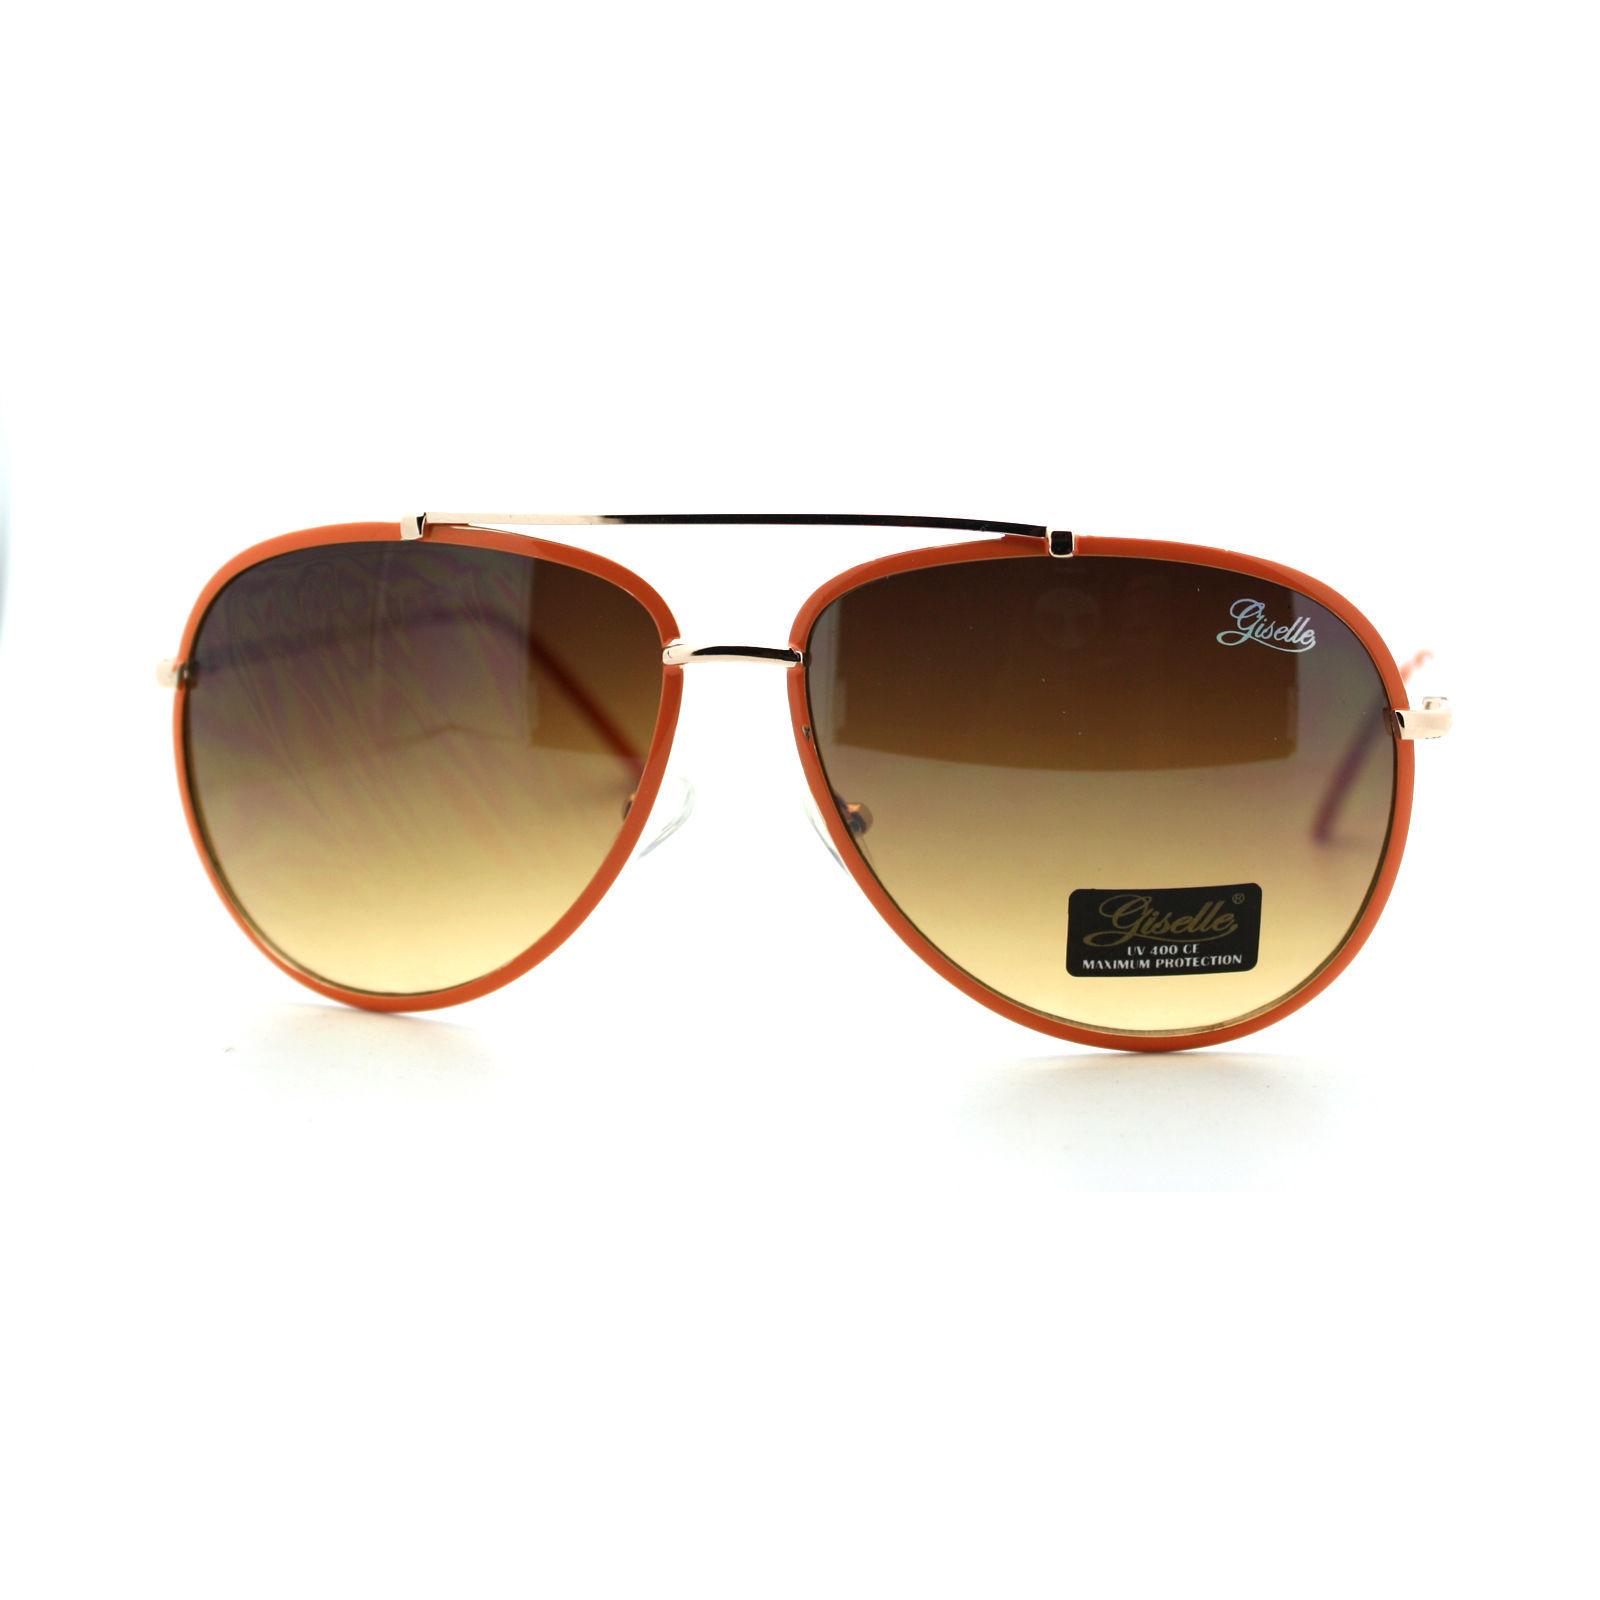 Giselle Lunettes Womens Aviator Sunglasses Top Bar Metal Frame